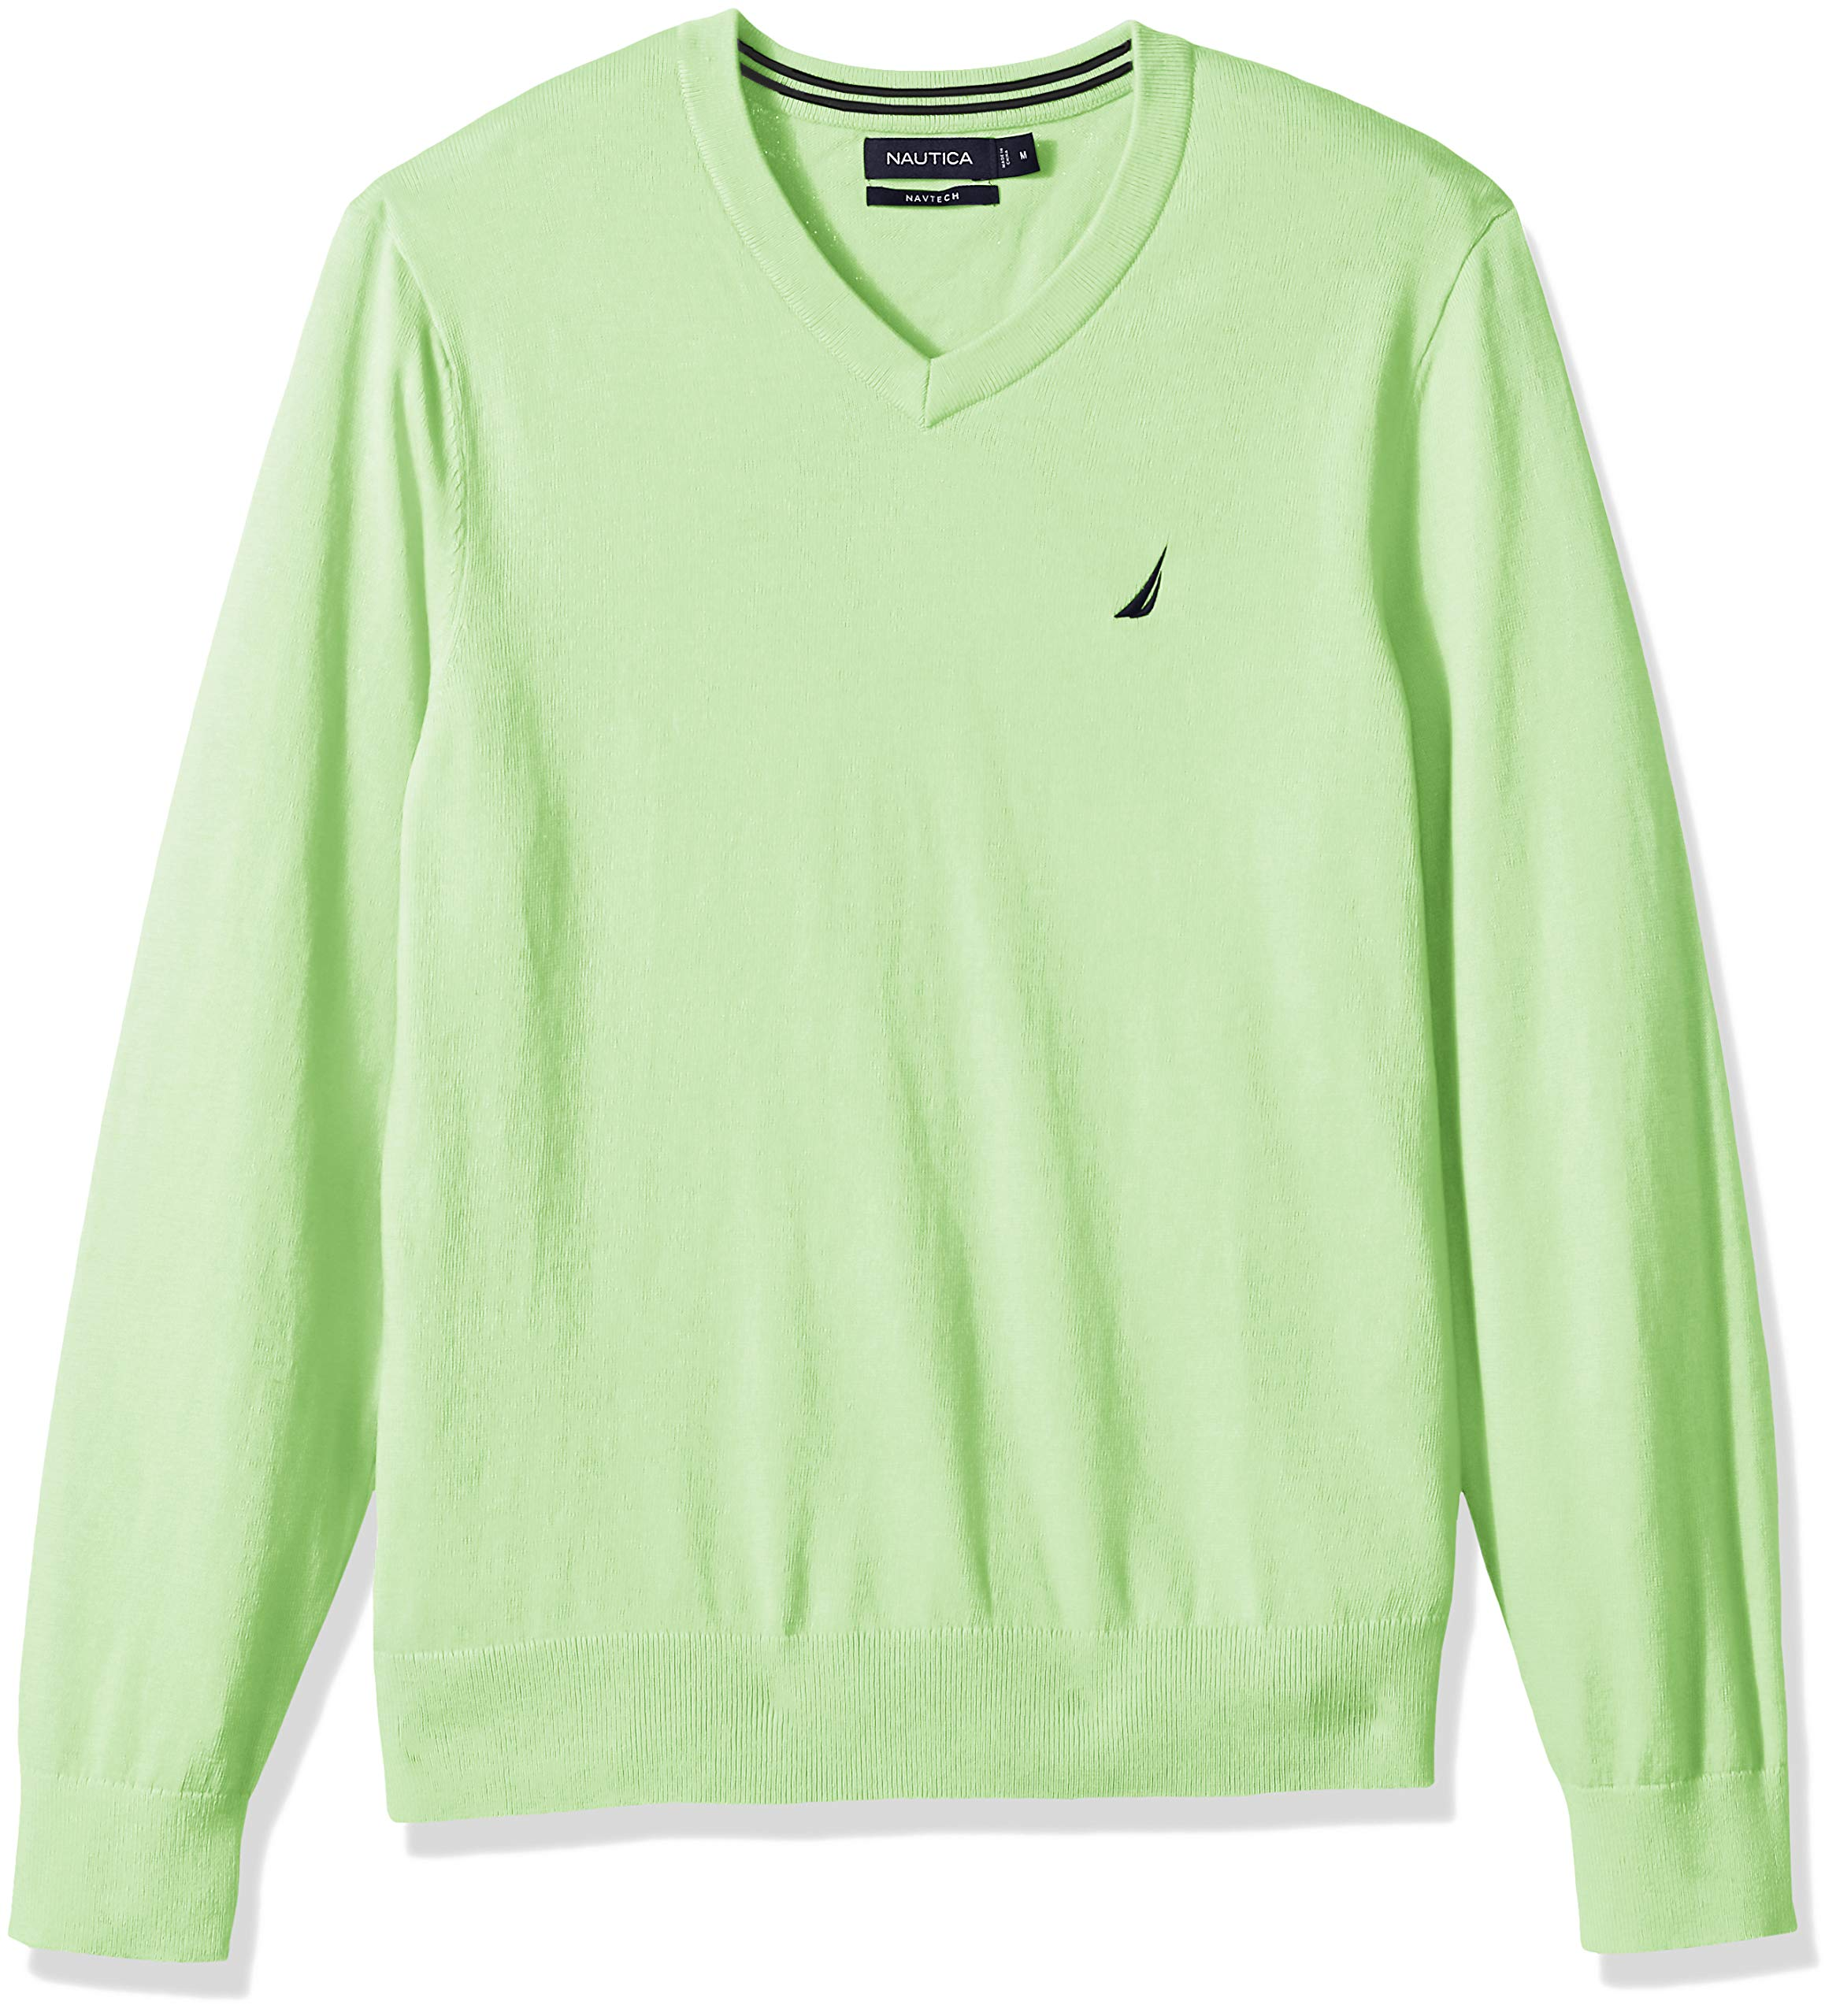 Nautica Men's Long Sleeve Solid Classic V-Neck Sweater, Patinagreen, Medium